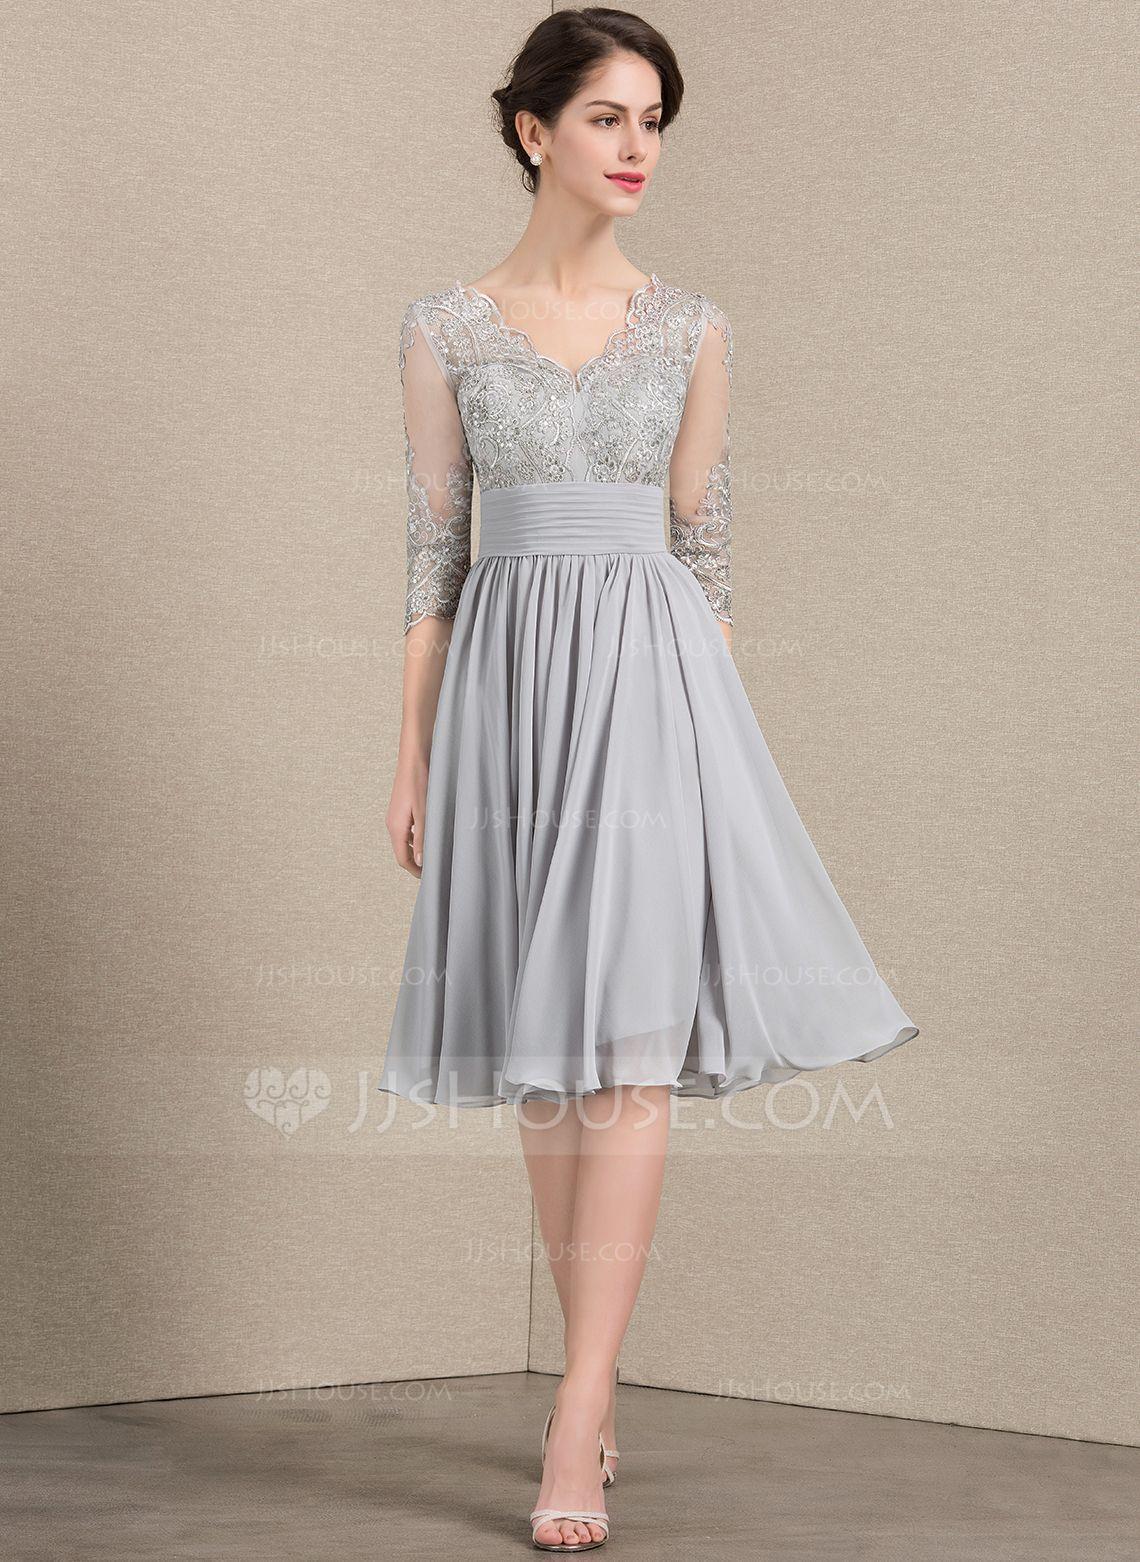 12b501eaa3e7 A-Line/Princess V-neck Knee-Length Chiffon Lace Mother of the Bride Dress  With Ruffle Sequins (008143372) - Mother of the Bride Dresses - JJsHouse